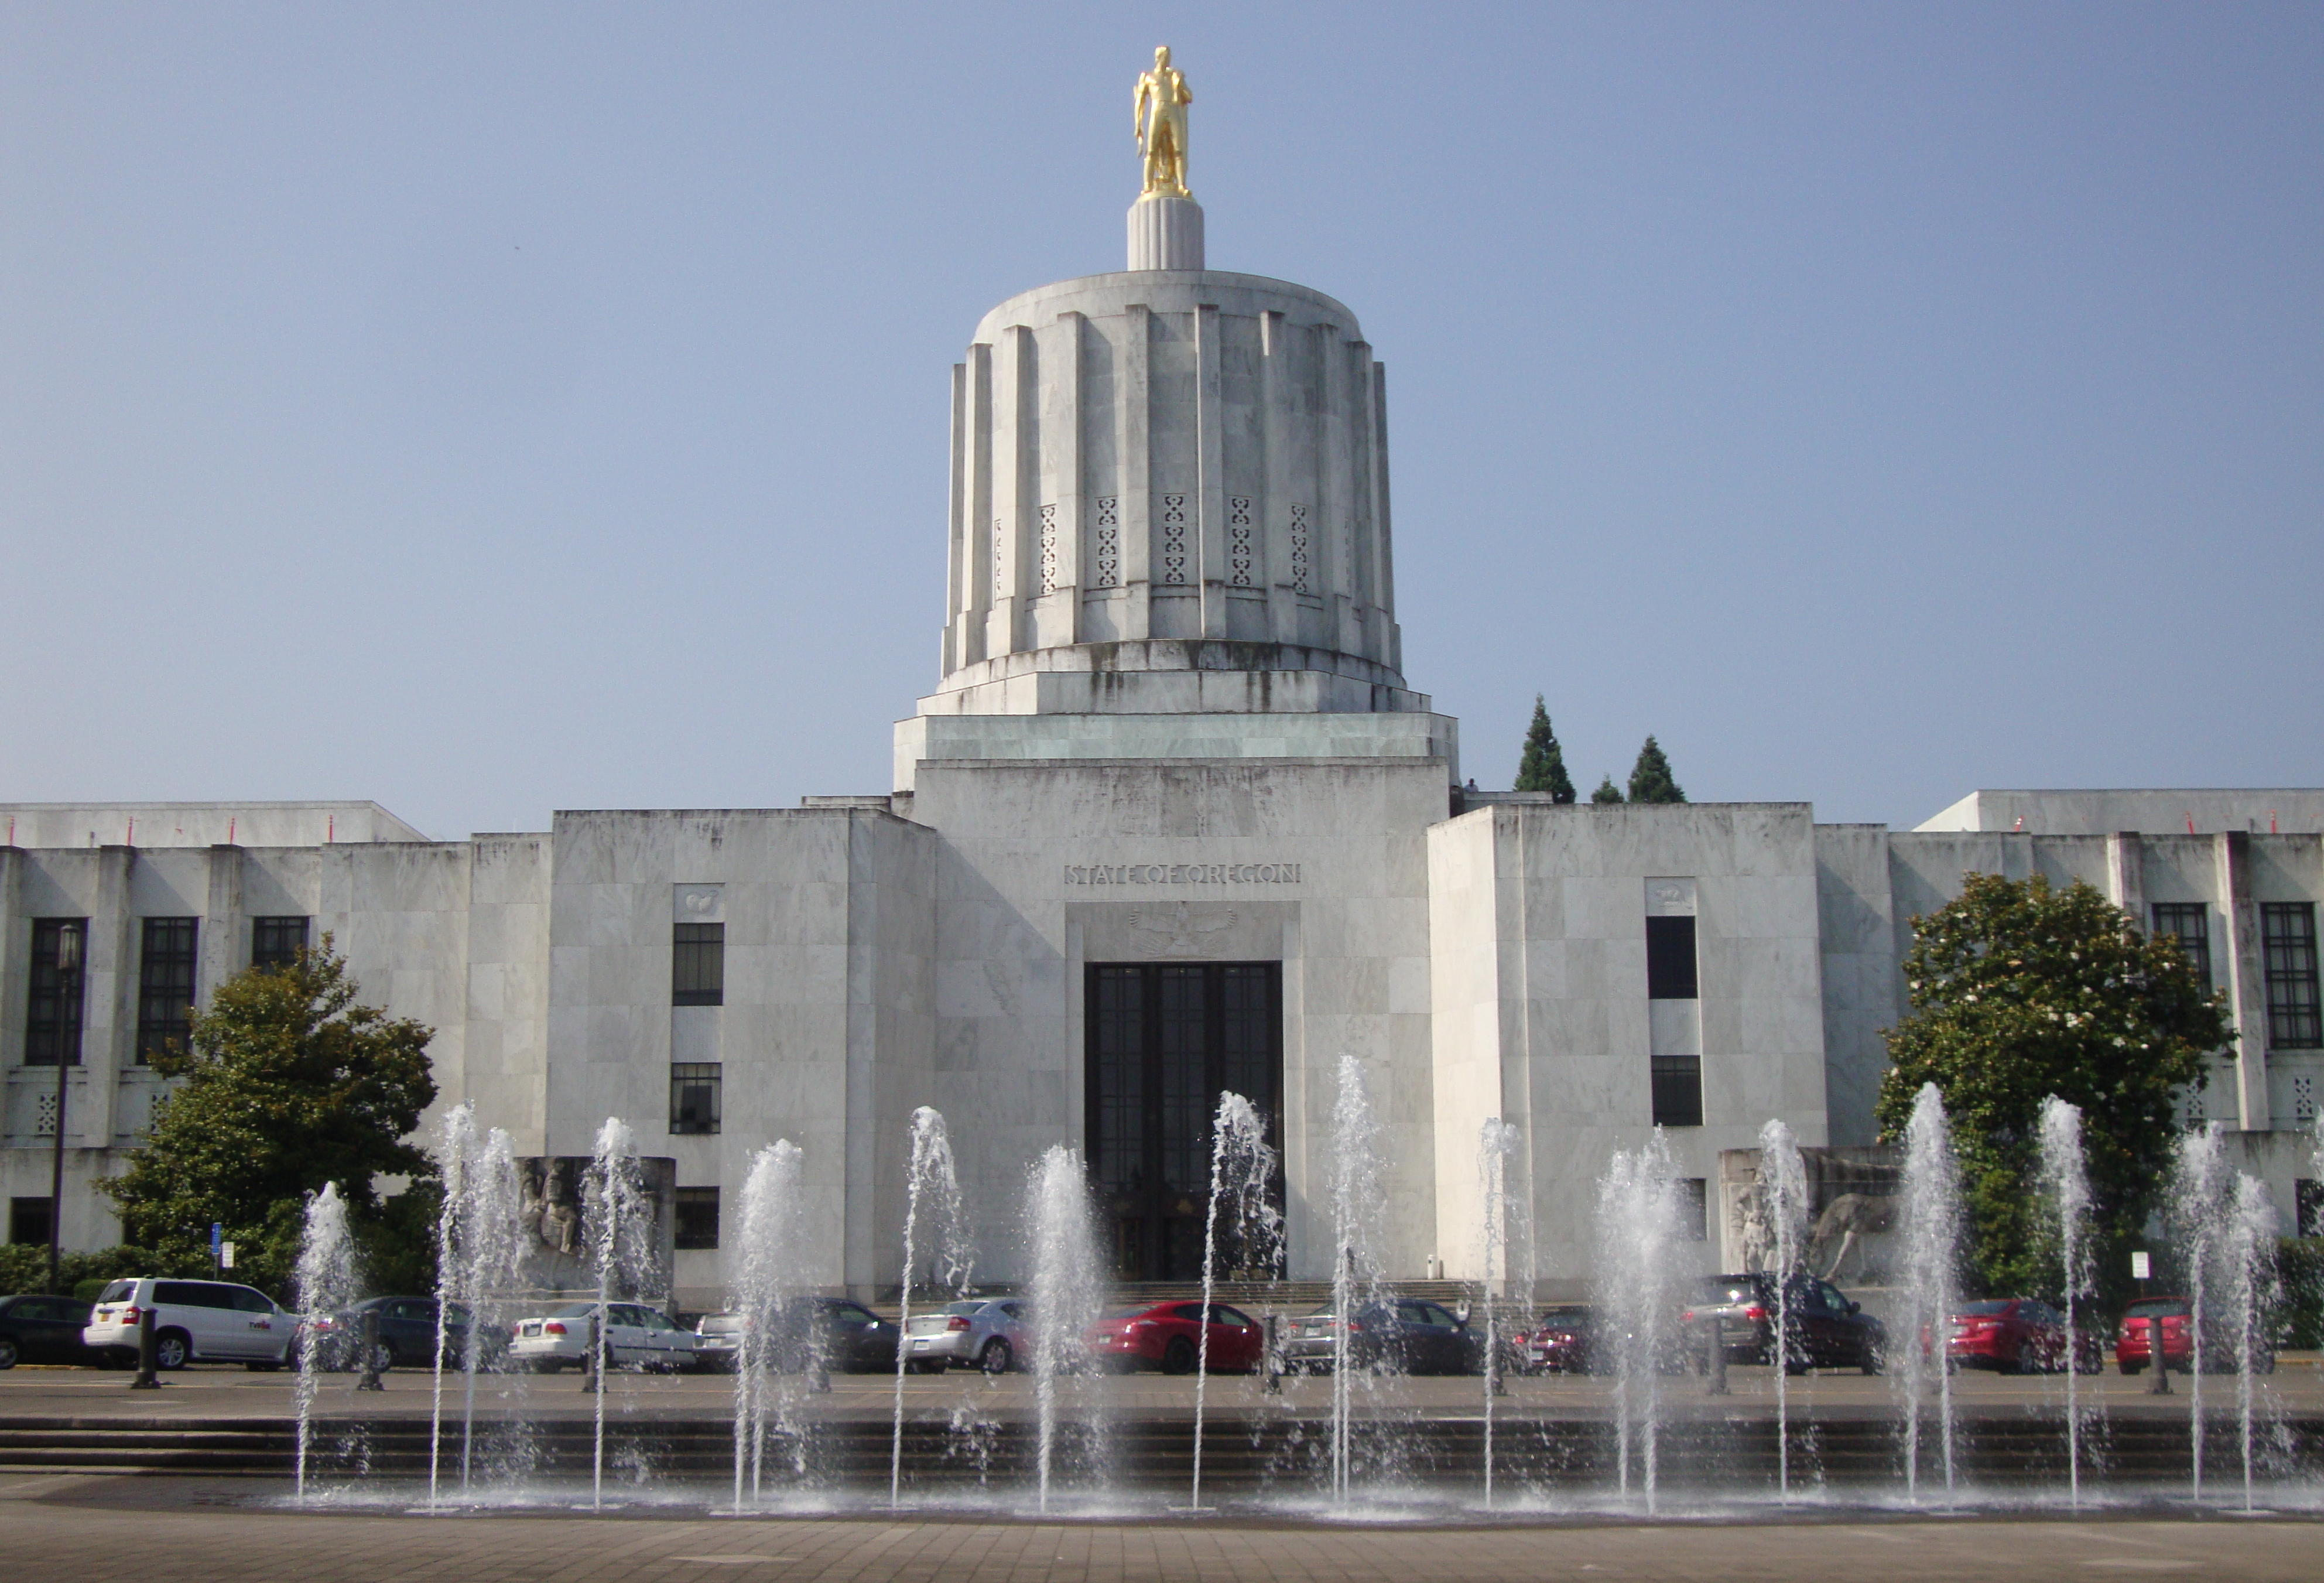 Oregon State Capitol (Salem, Oregon)